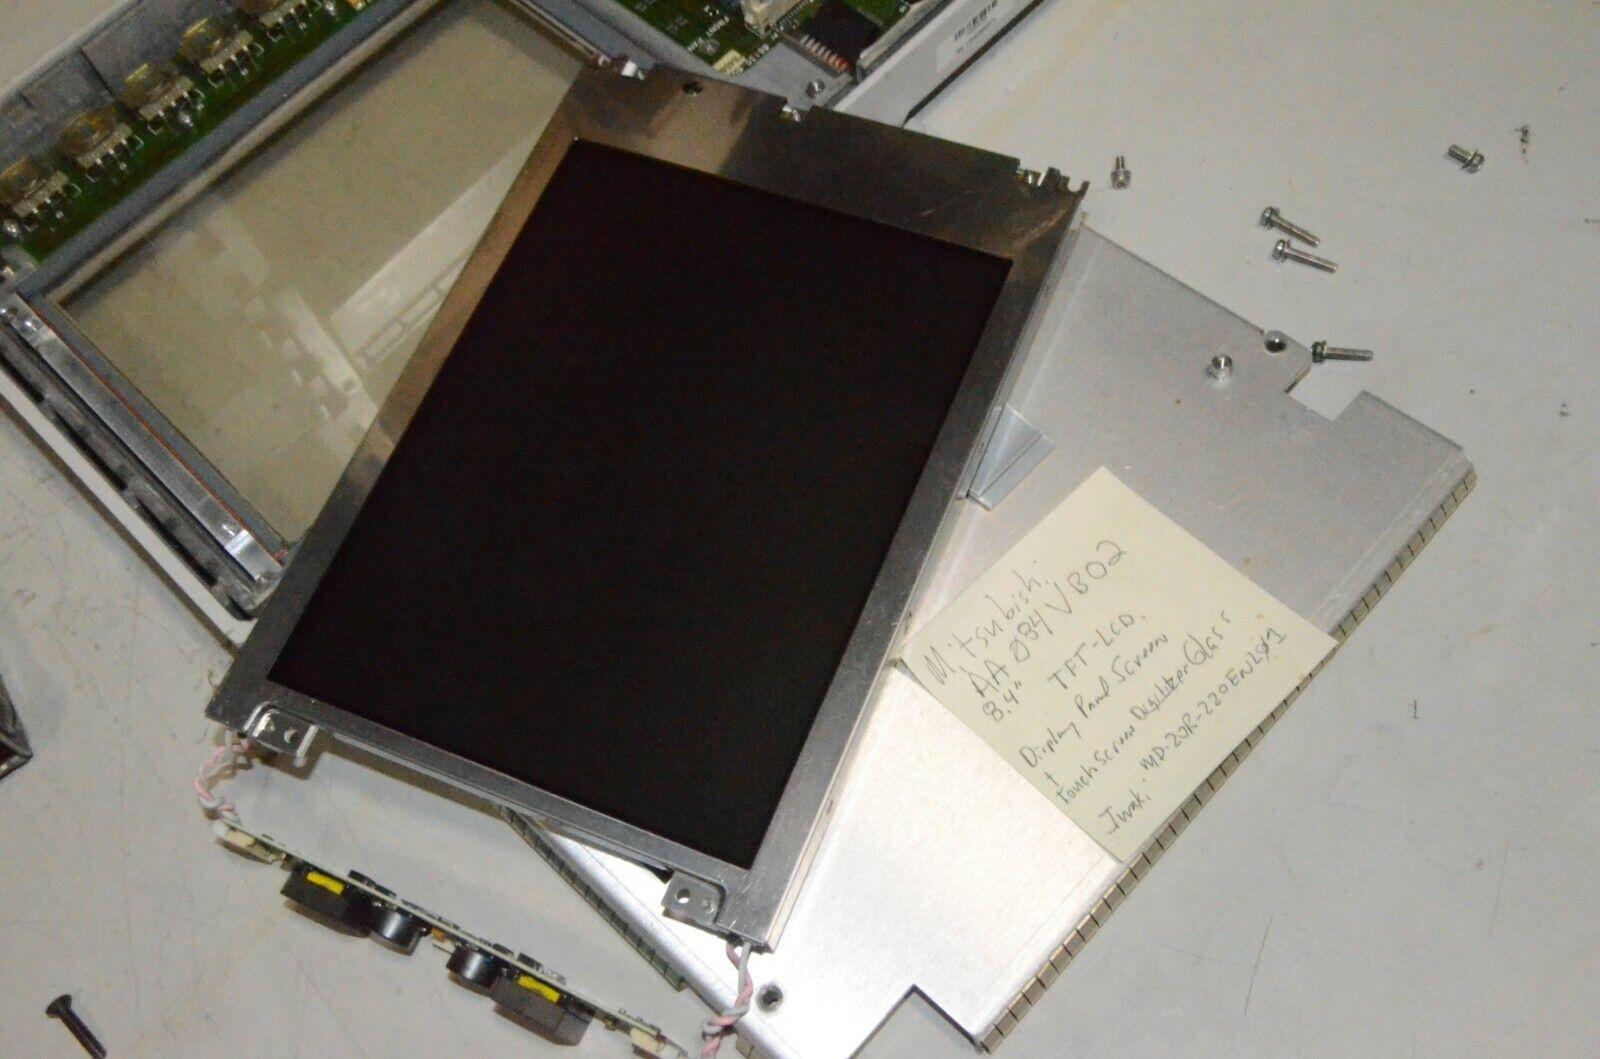 HLMP-4700 HP LED 5mm Red  1PC OR 5PCS